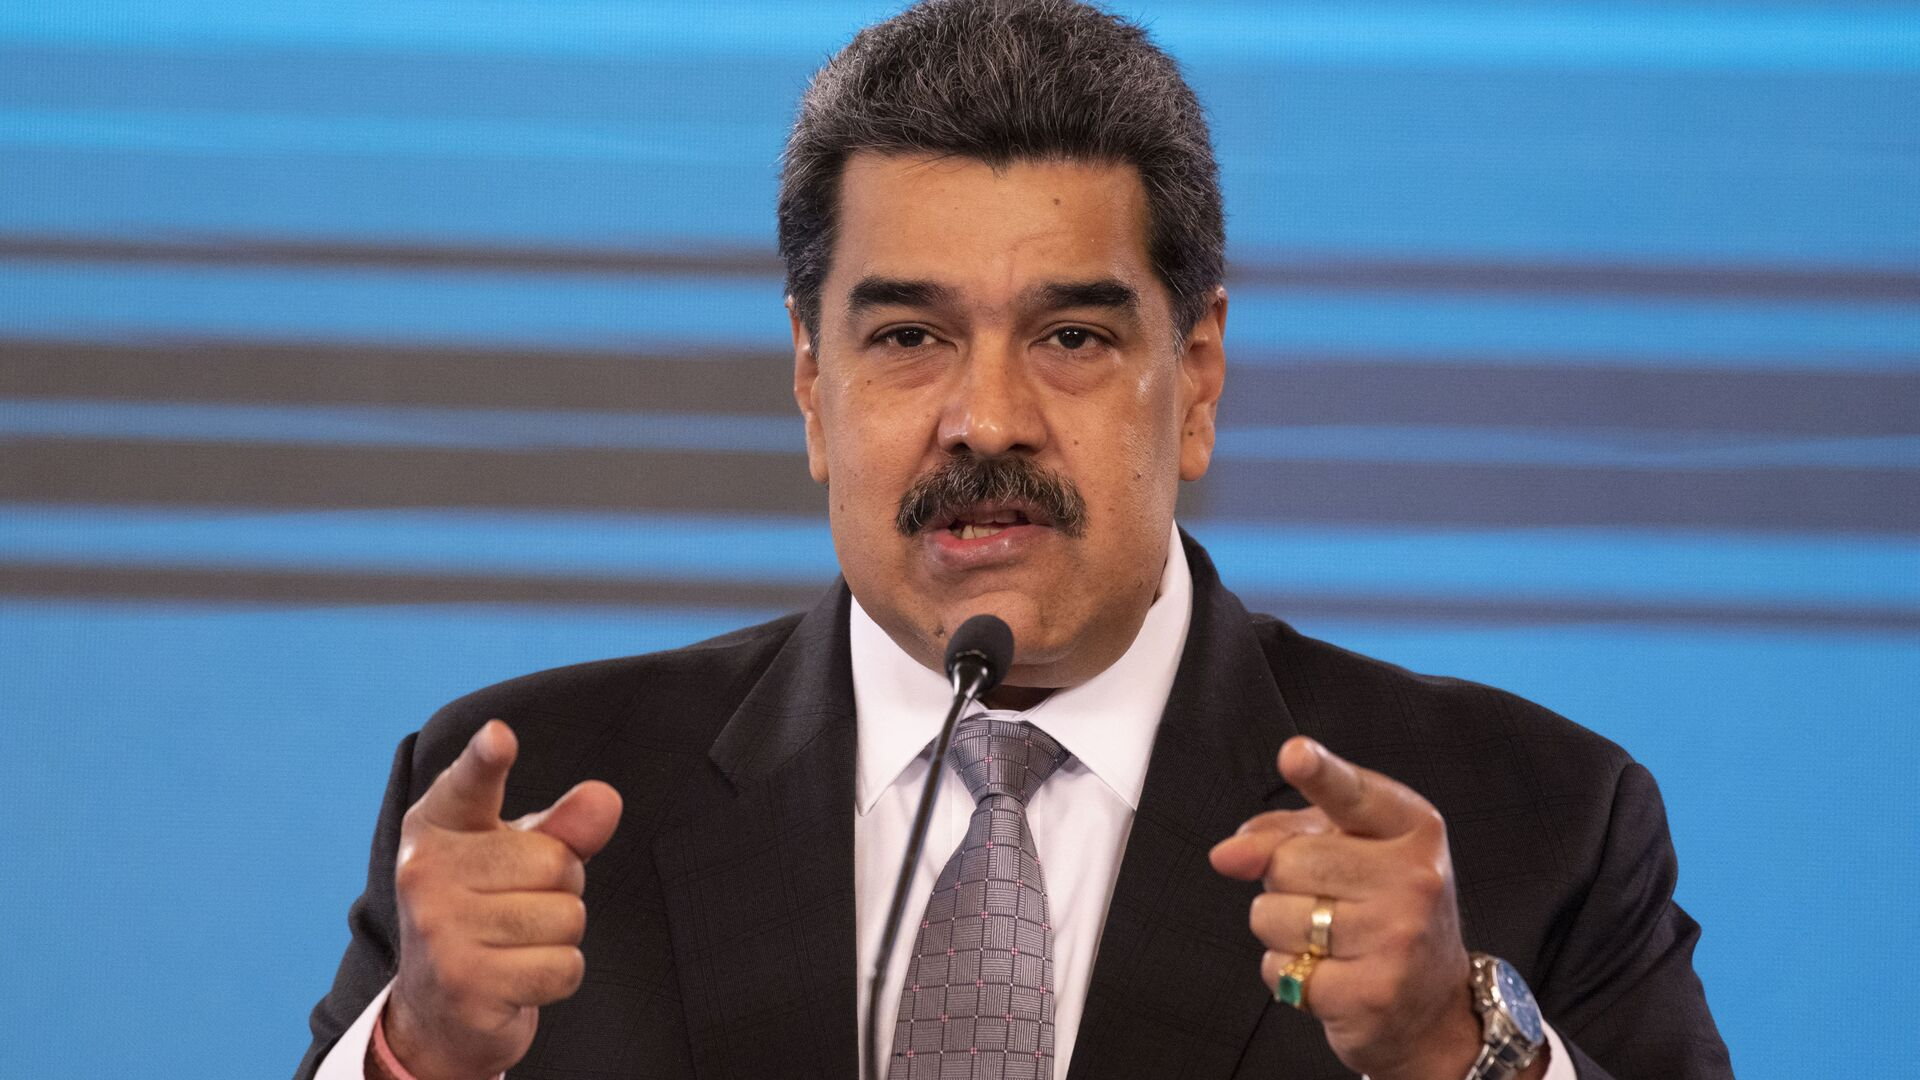 Conferenza stampa del Presidente venezuelano Nicolas Maduro al palazzo presidenziale Miraflores di Caracas, 17 febbraio 2021 - Sputnik Italia, 1920, 01.09.2021